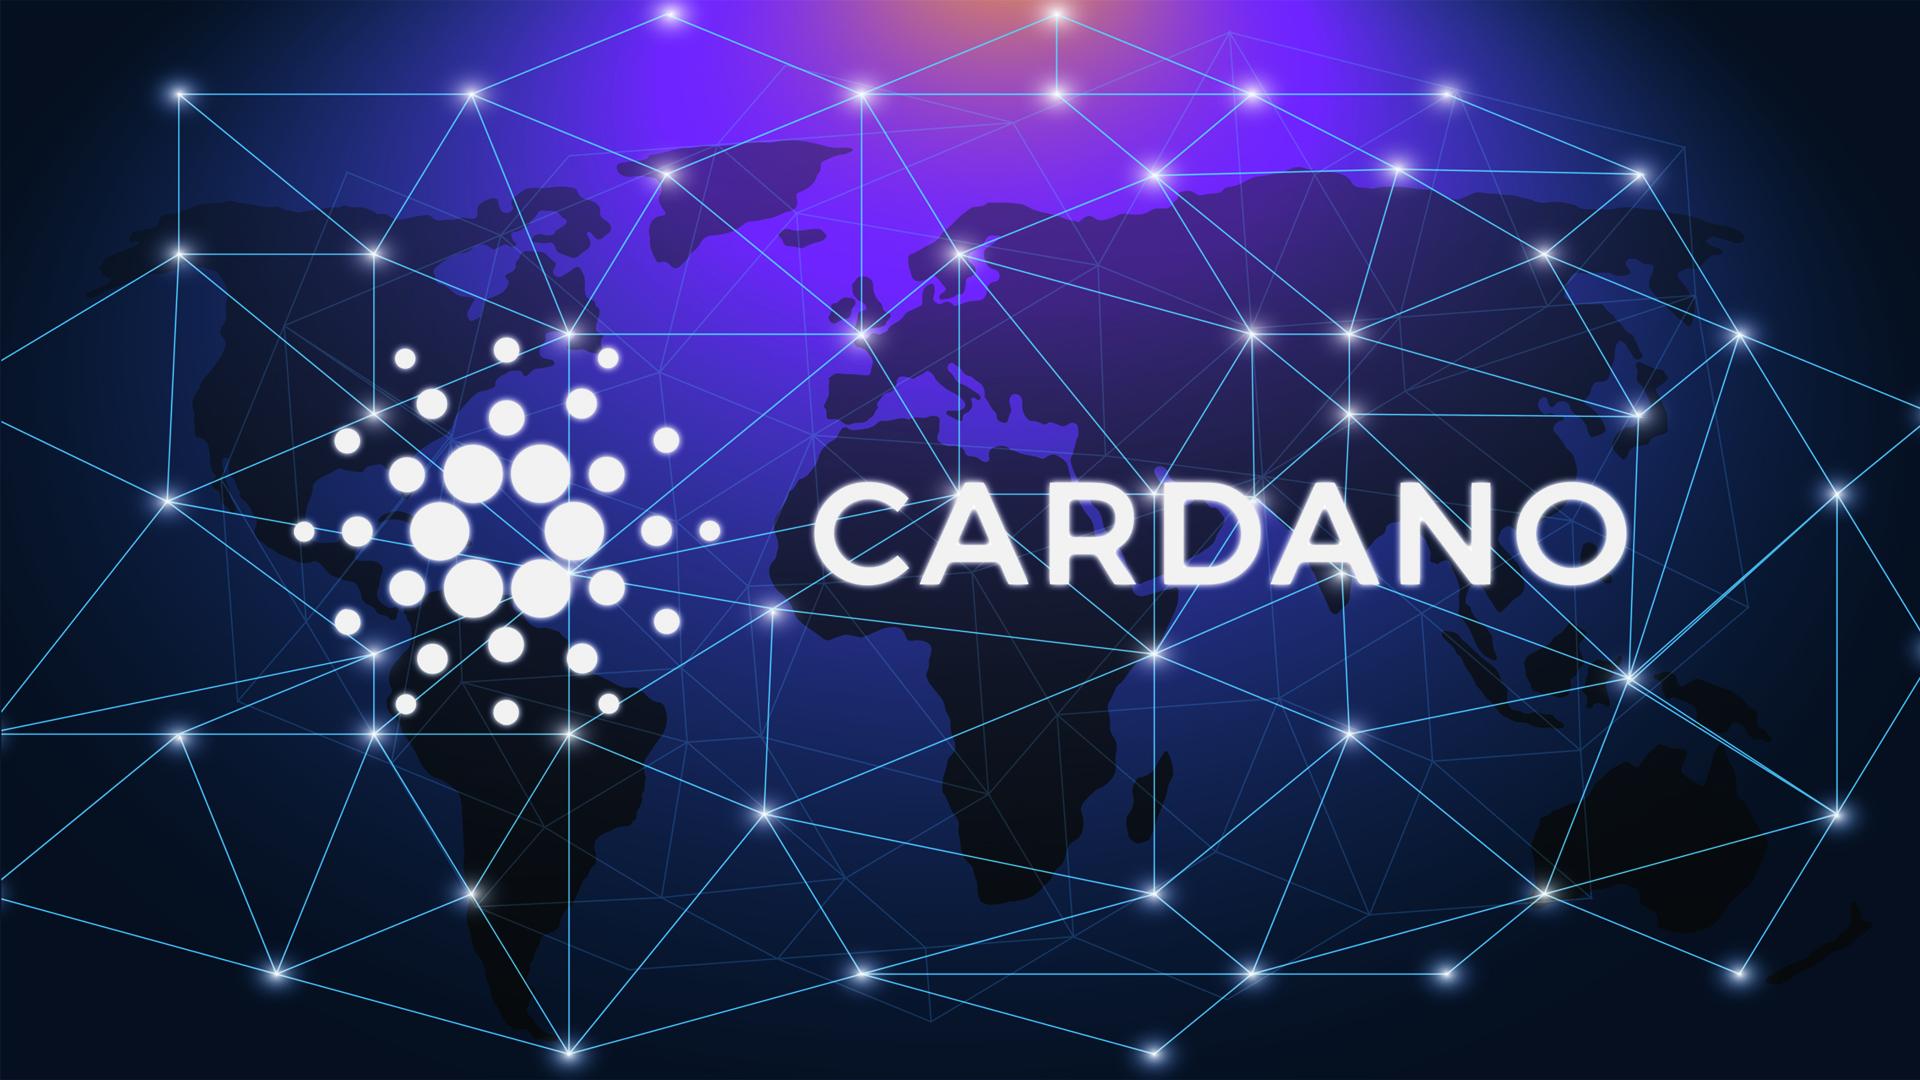 Cardano Best Blockchain